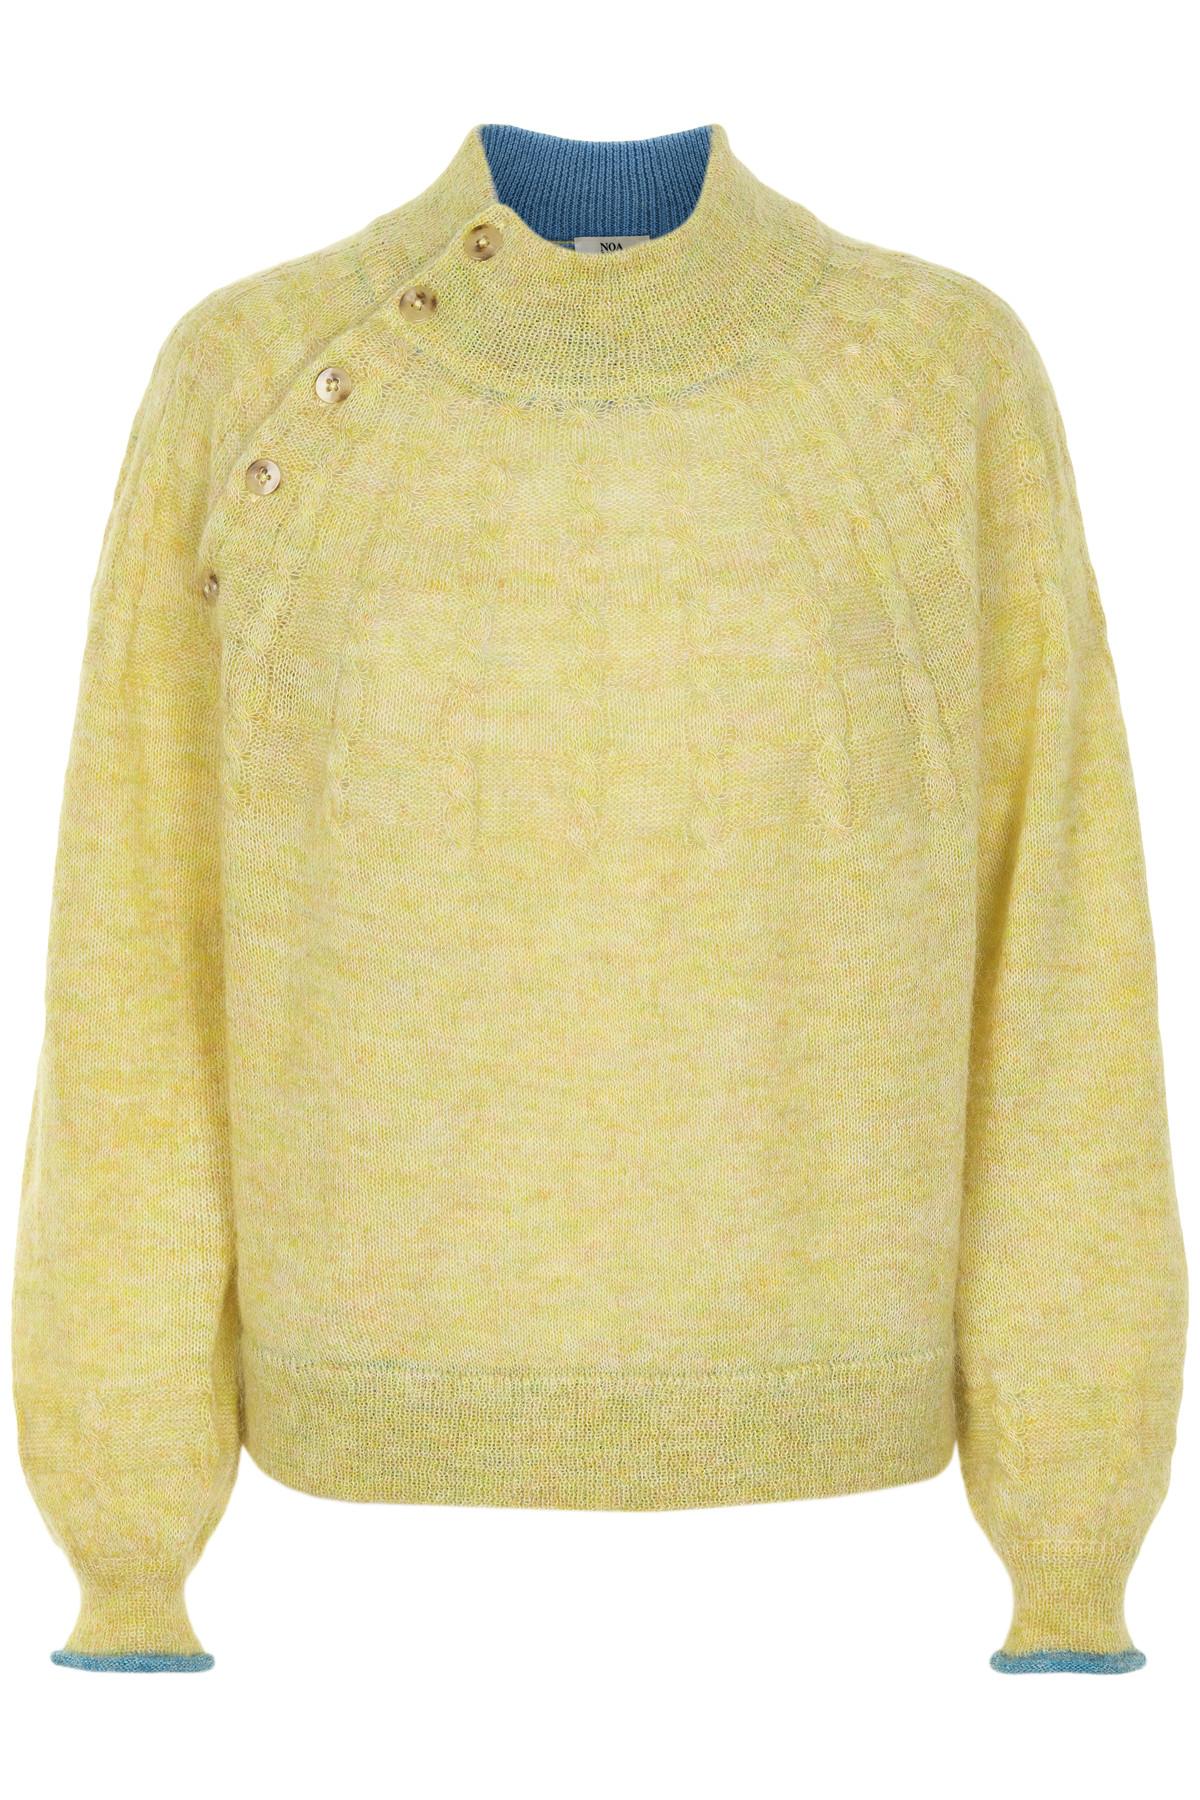 Image of   NOA NOA PULLOVER 1-9614-1 001027 (Yellow, XXS)